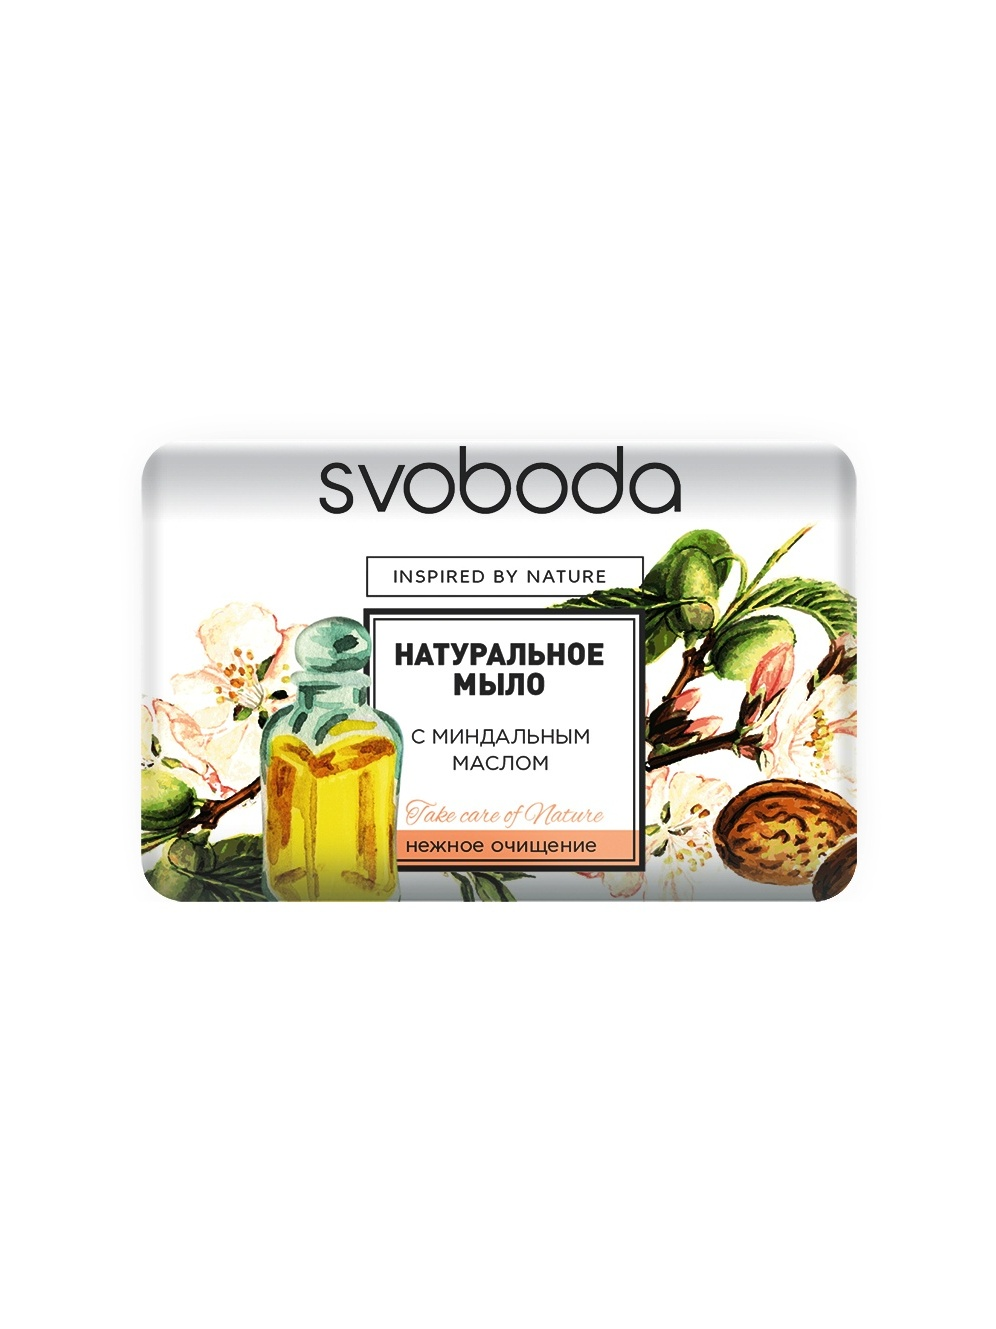 T/M Natural SVOBODA With Almond Oil In The.